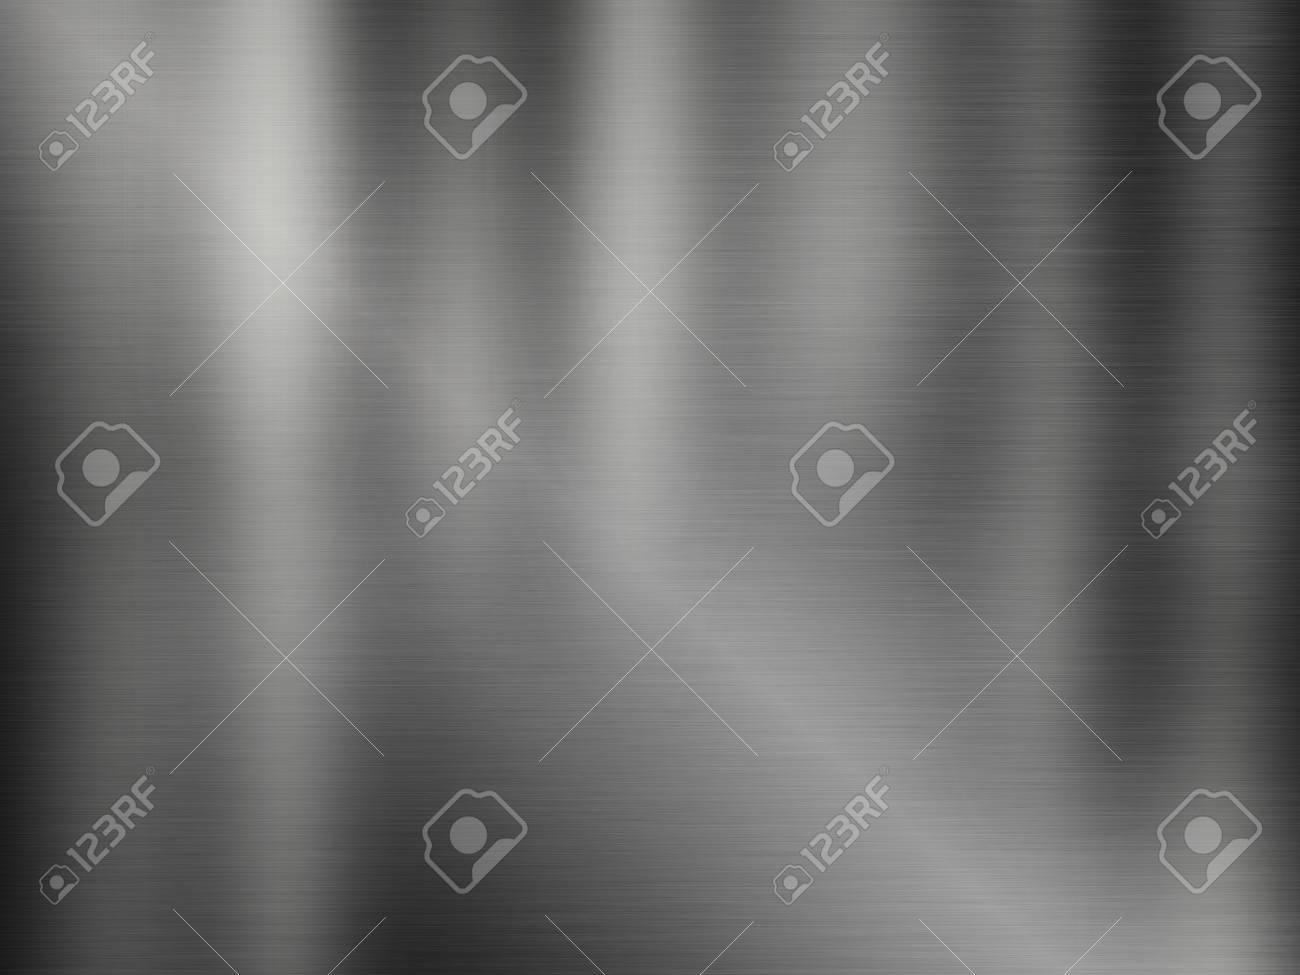 texture en acier inoxydable ou en métal texture de fond Banque d'images - 75076760